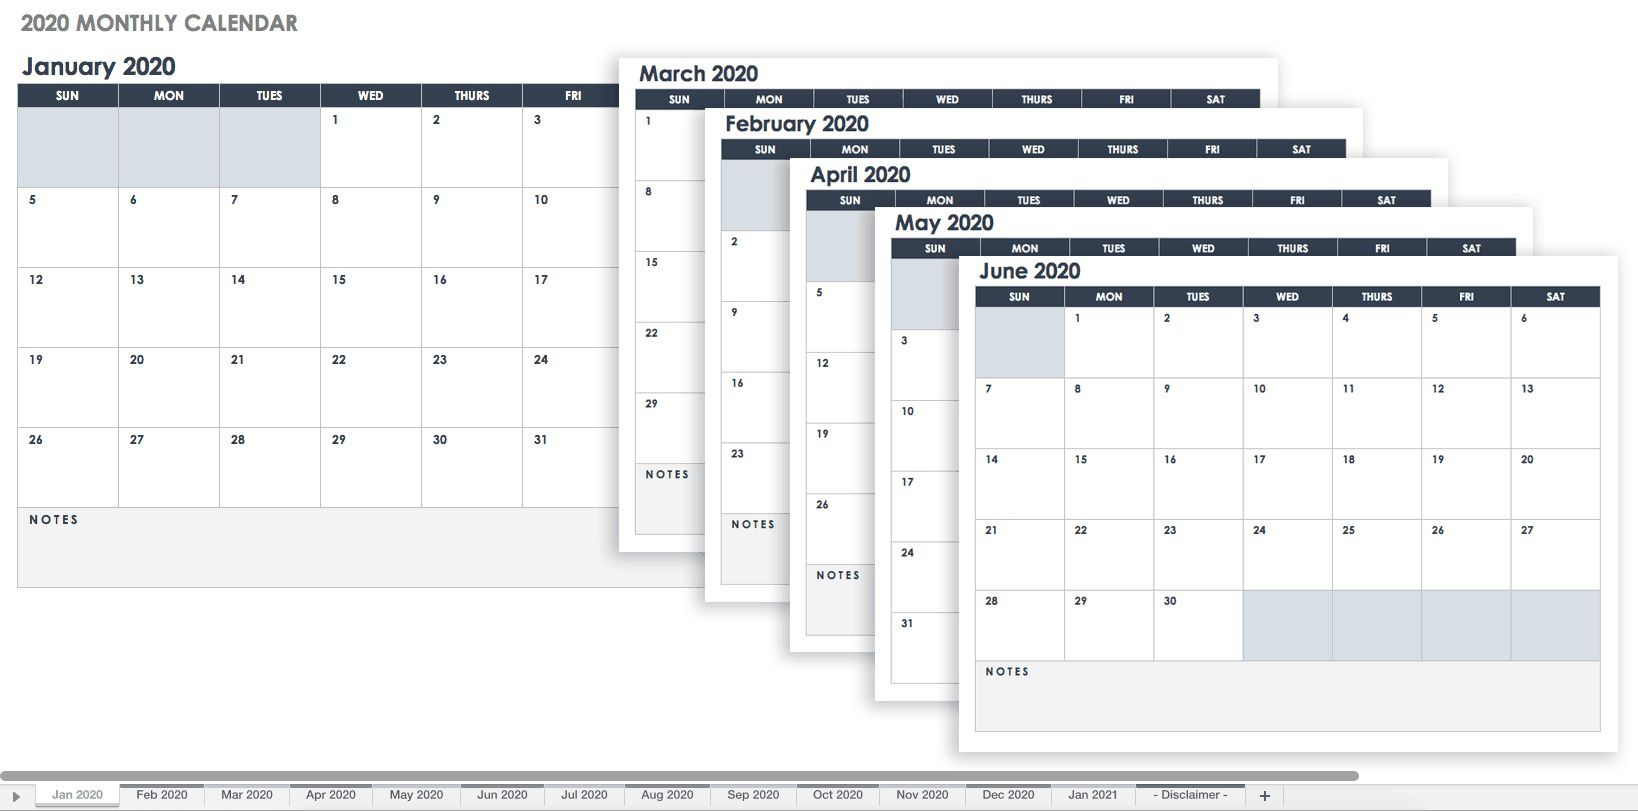 005 Simple Google Sheet Calendar Template Photo  Templates Monthly Spreadsheet 2020 2018Full